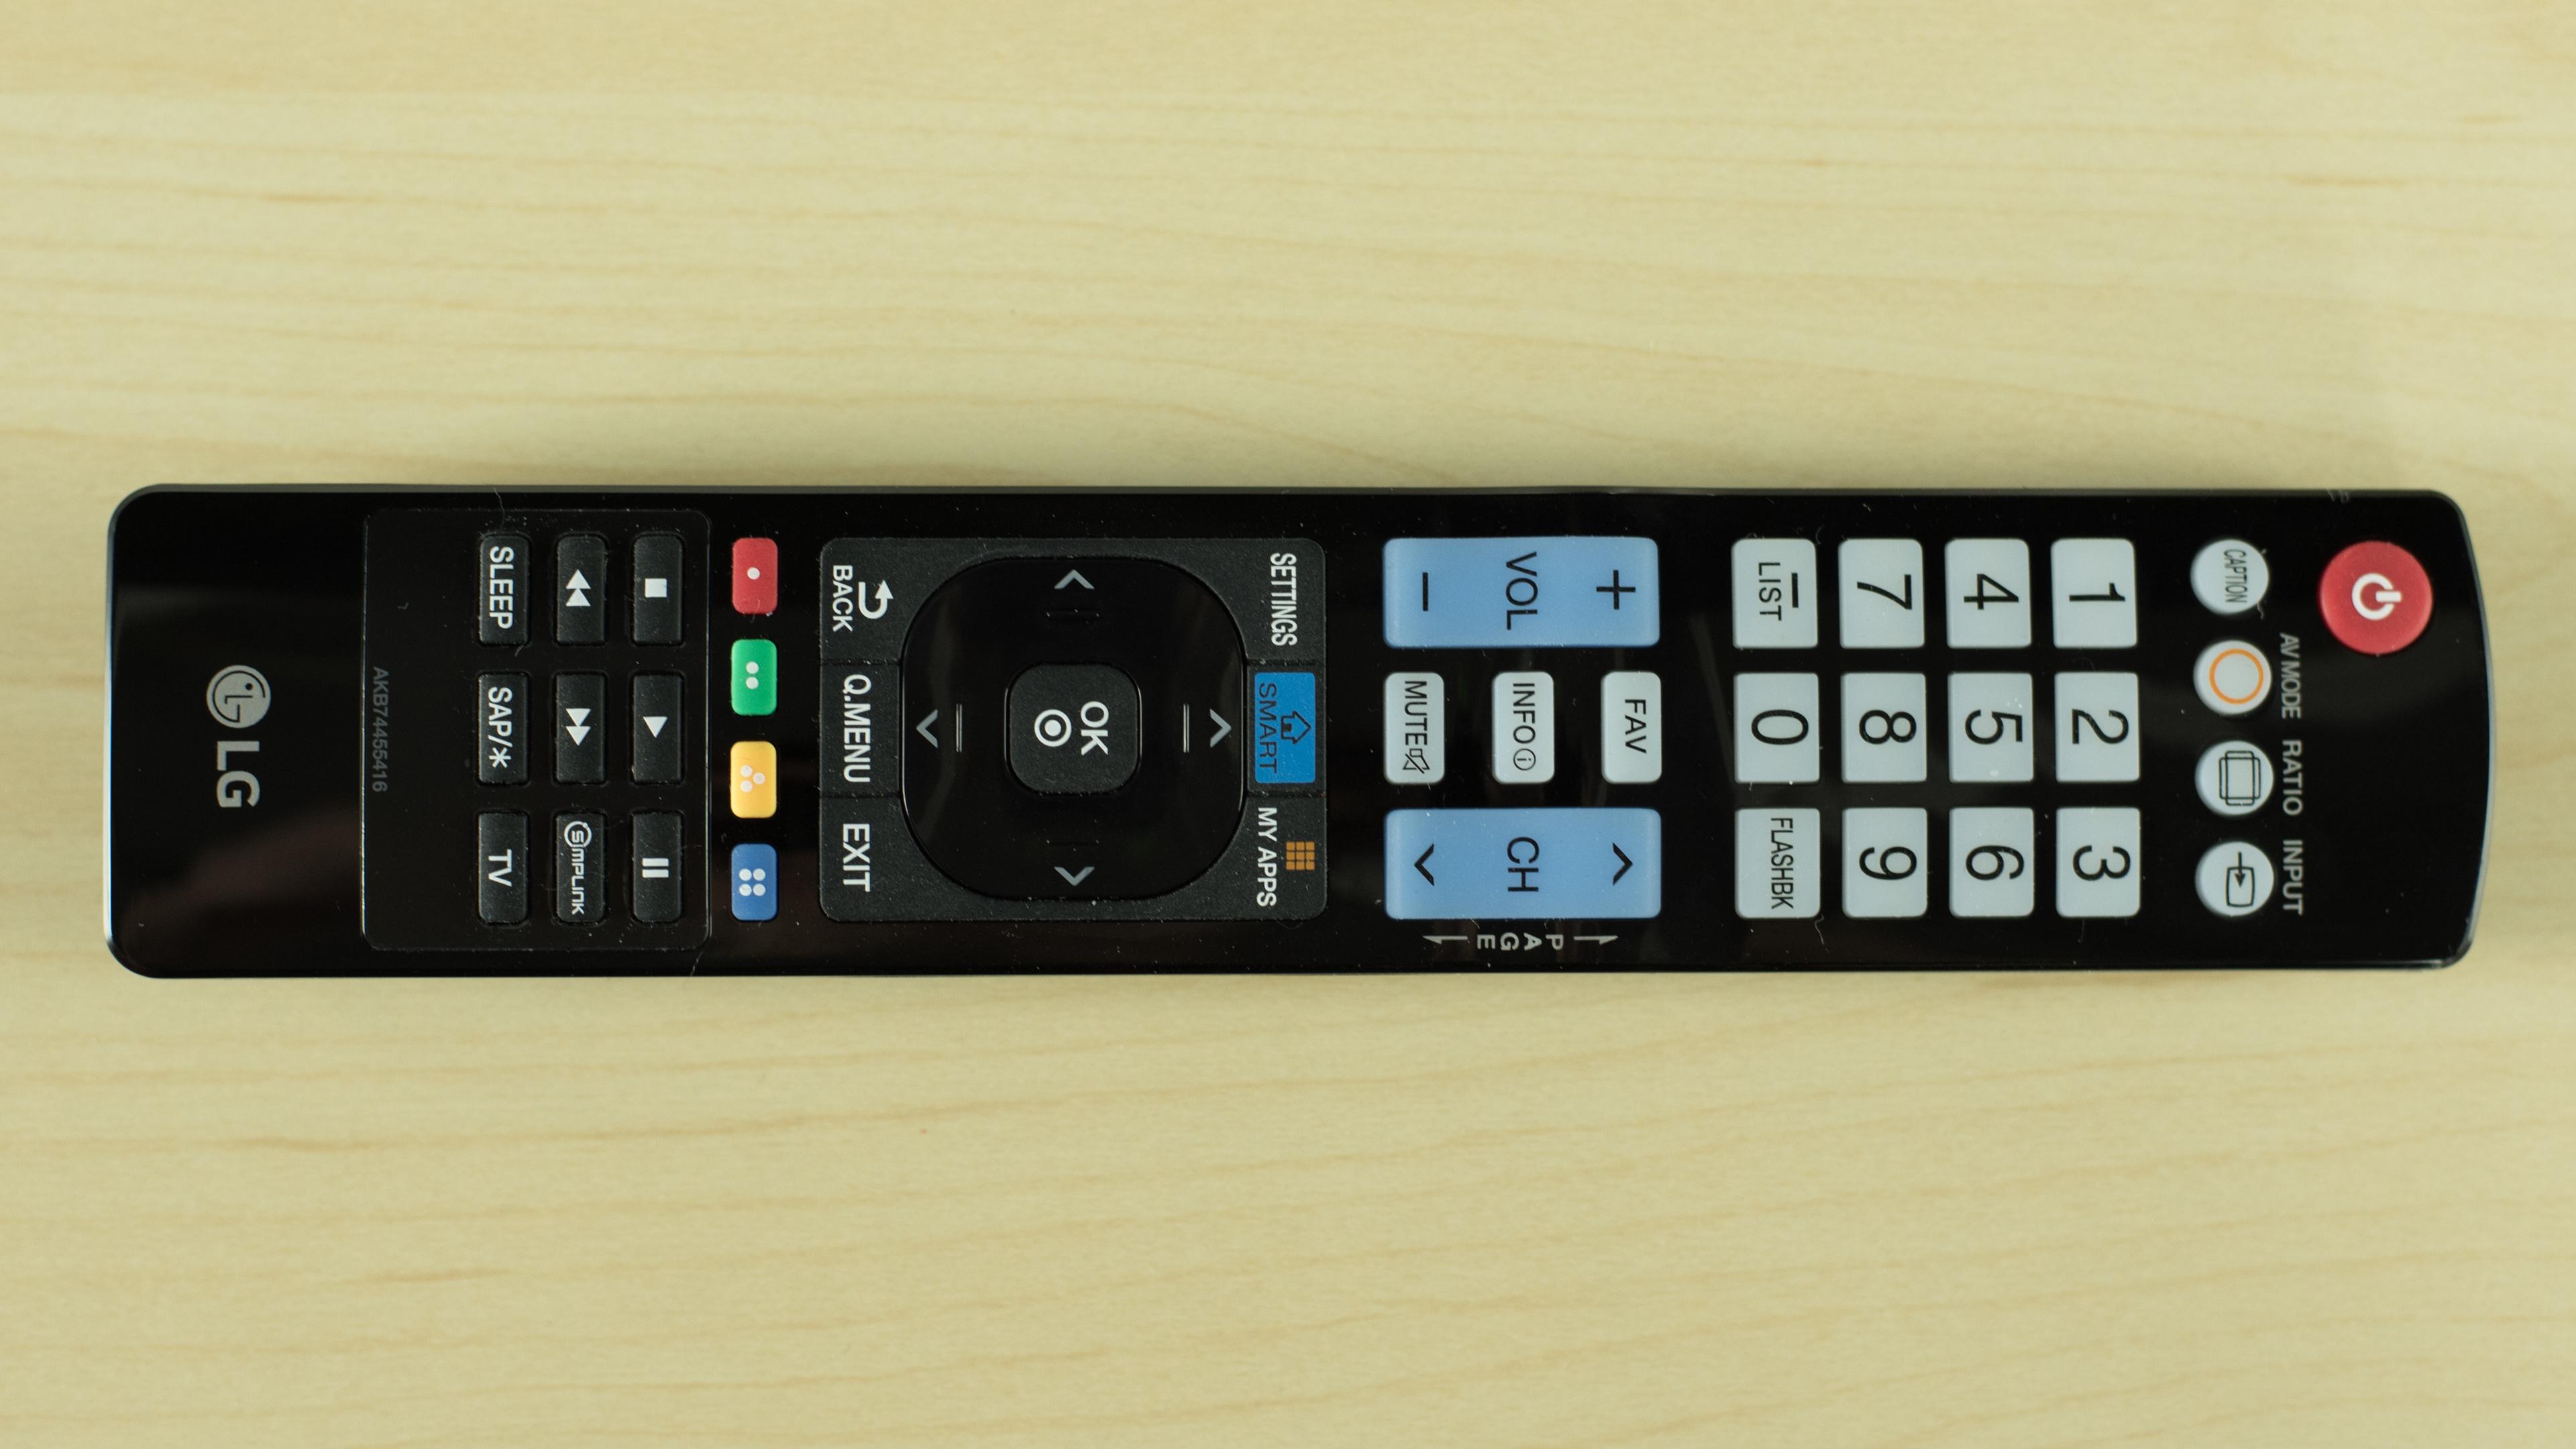 lg smart tv remote diagram smart auto parts catalog and lg tv remote control circuit diagram 50 LG TV Diagram